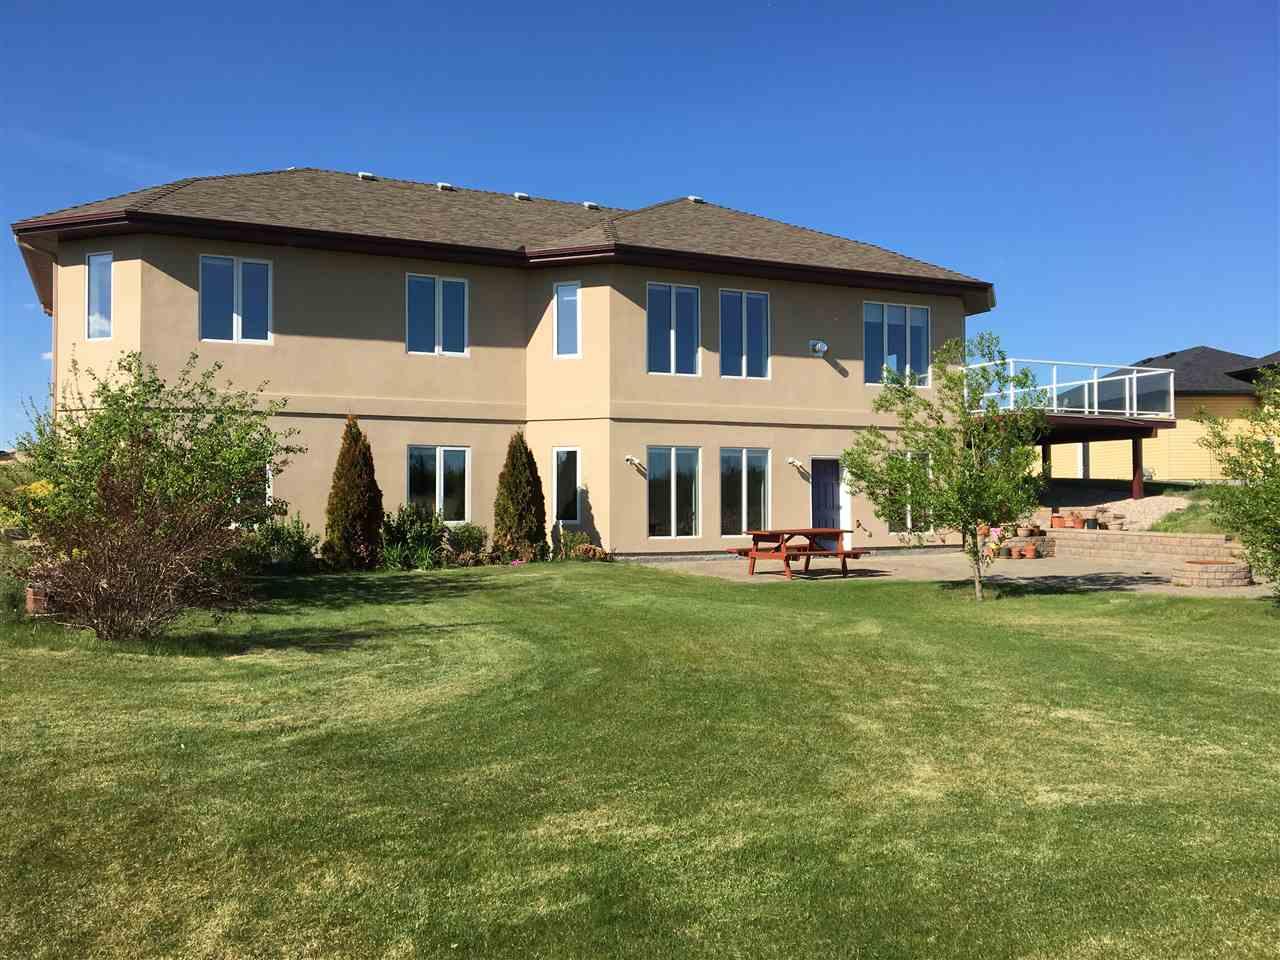 133 53017 Range Road 223, Rural Strathcona County, MLS® # E4157101